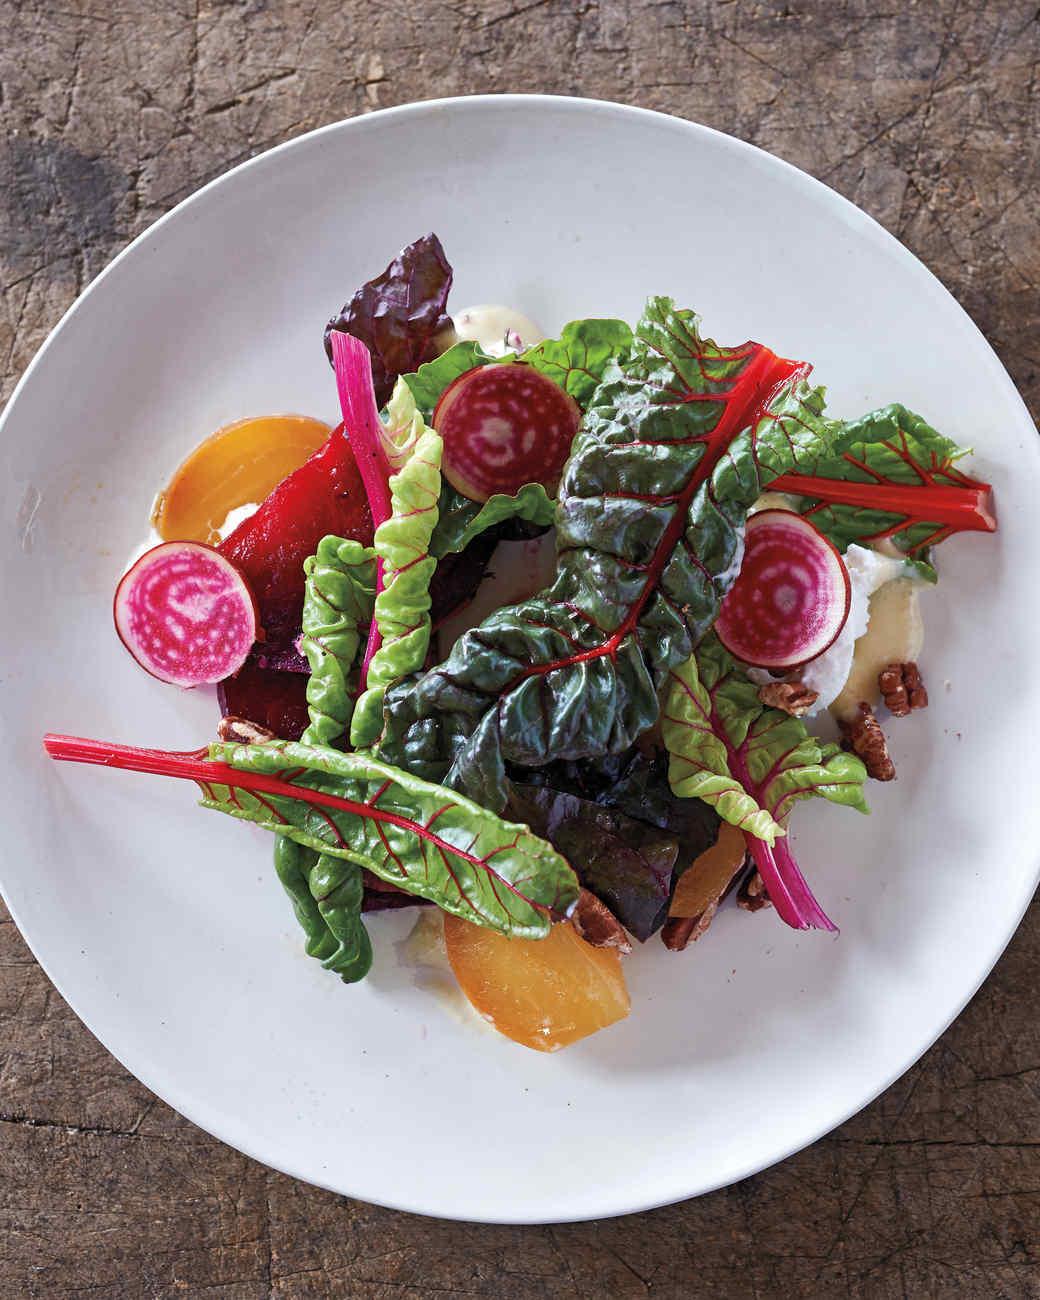 wyebrook-farm-salad-04-014-d111590.jpg